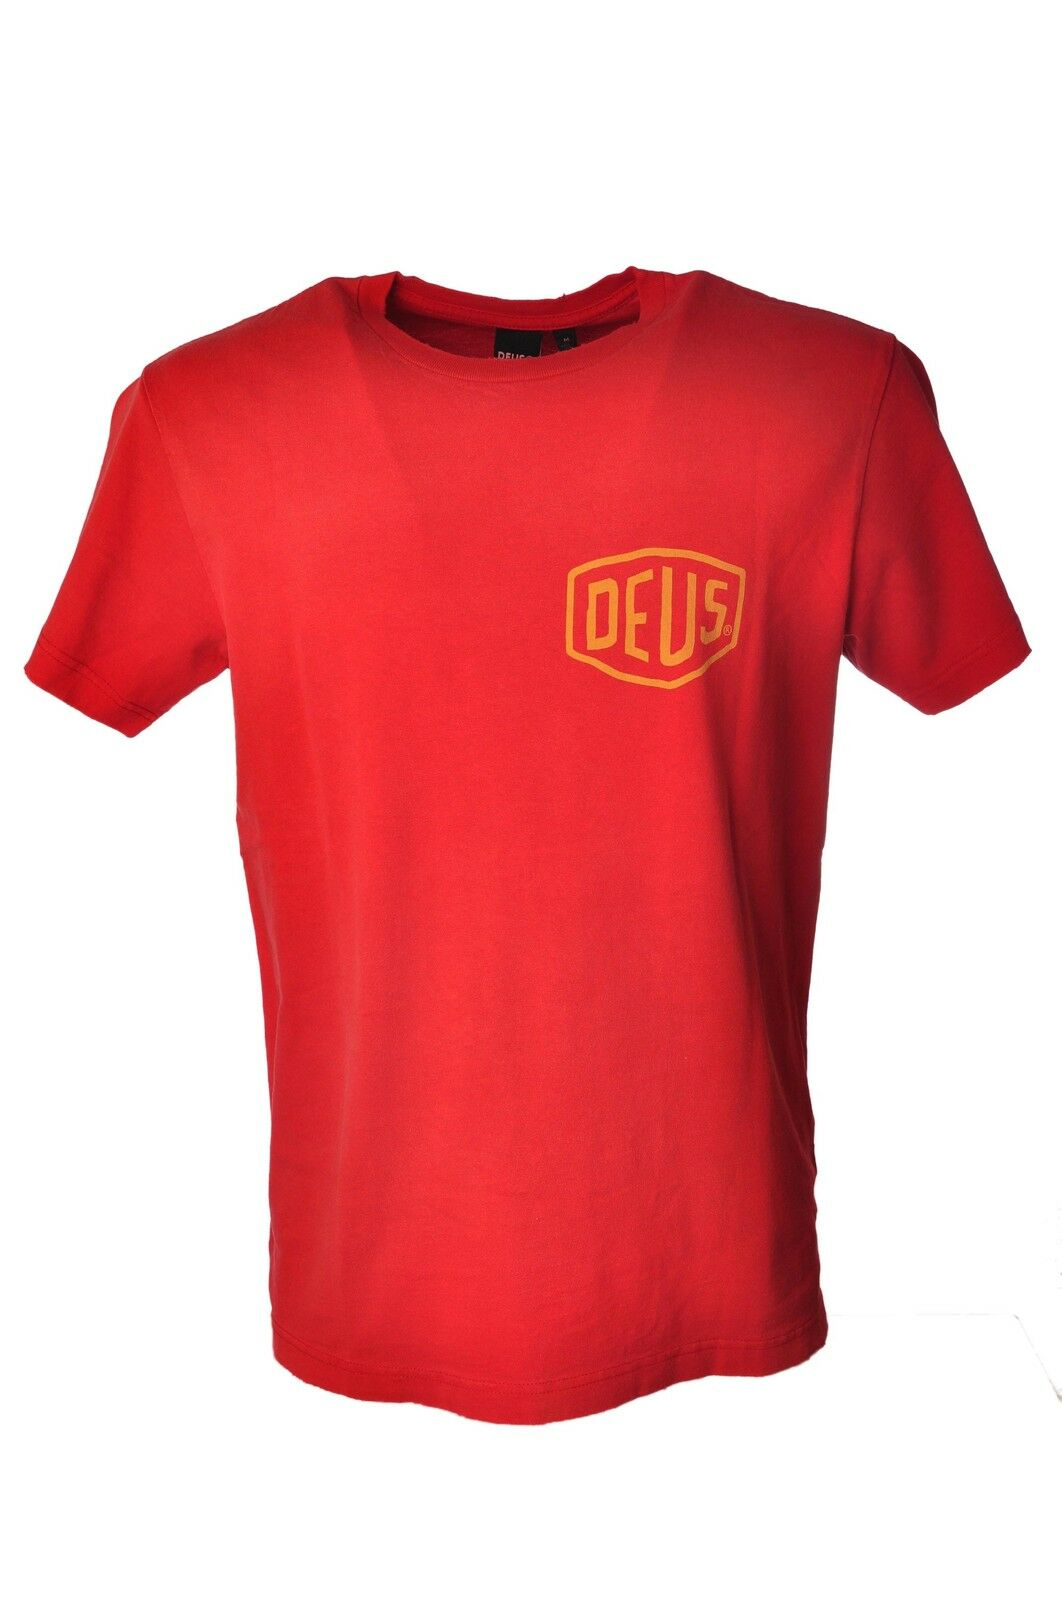 Deus  -  T - Male - Red - 3843329A184010